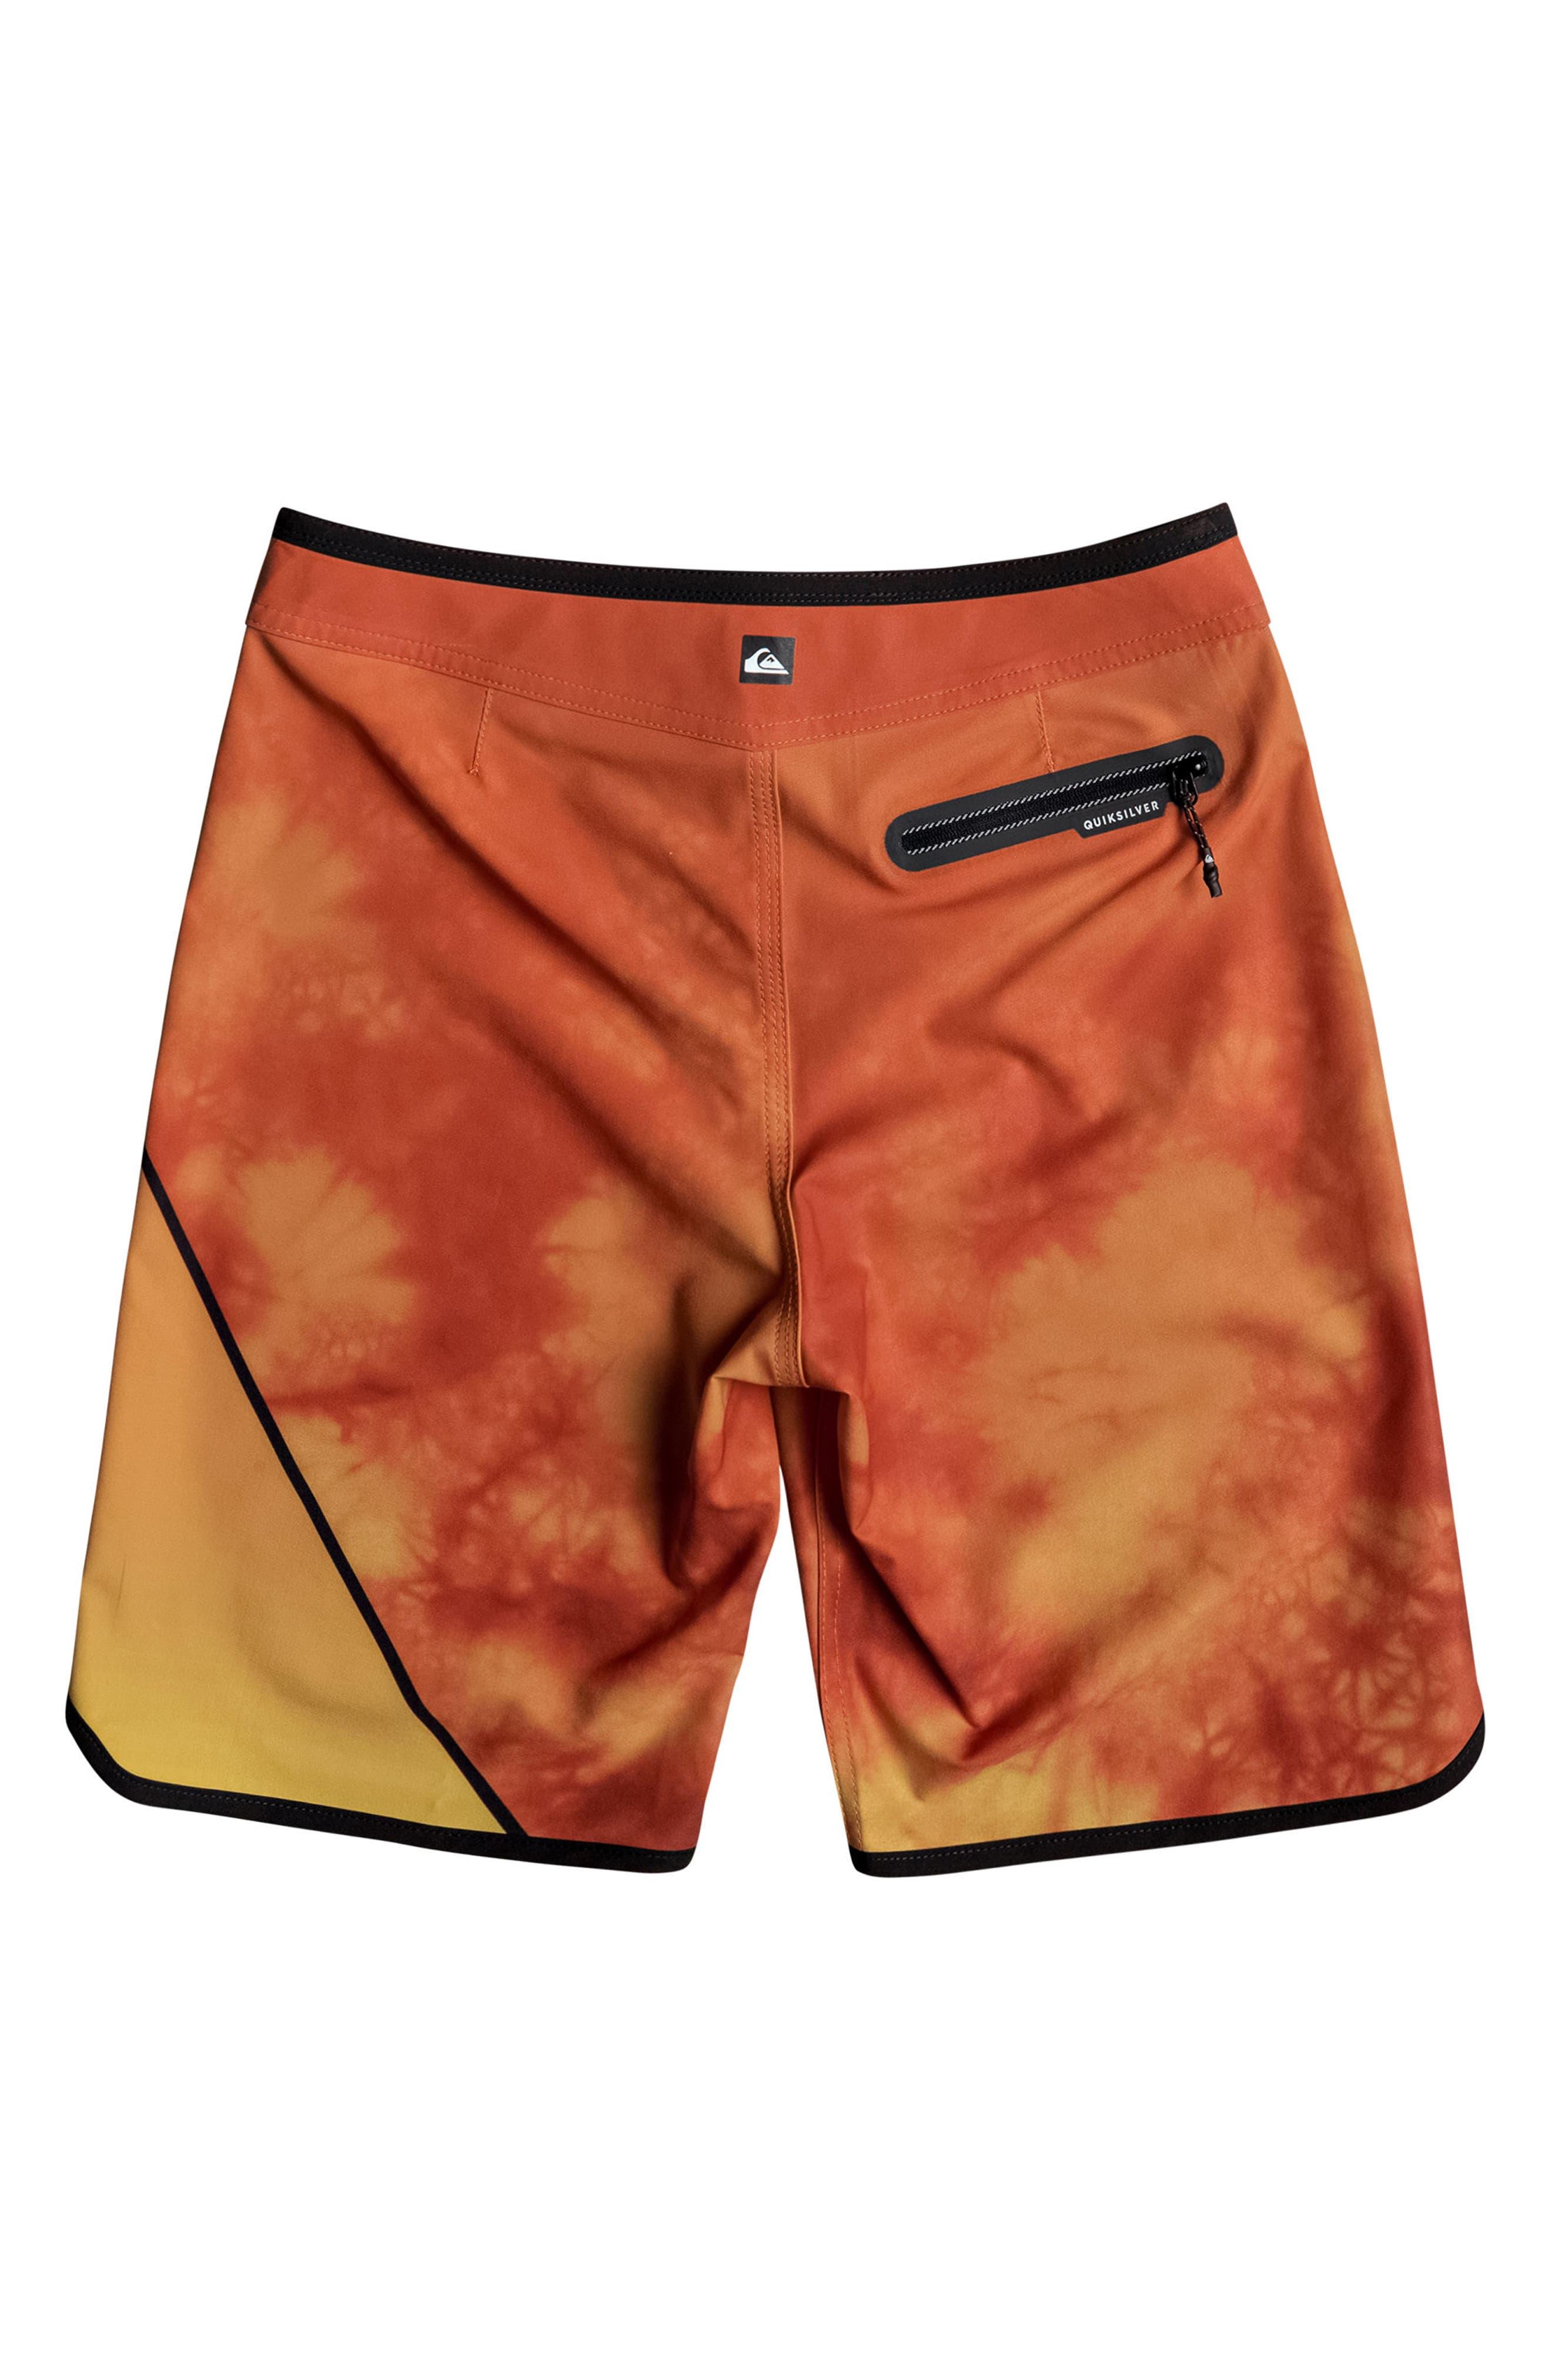 New Wave Board Shorts,                             Alternate thumbnail 4, color,